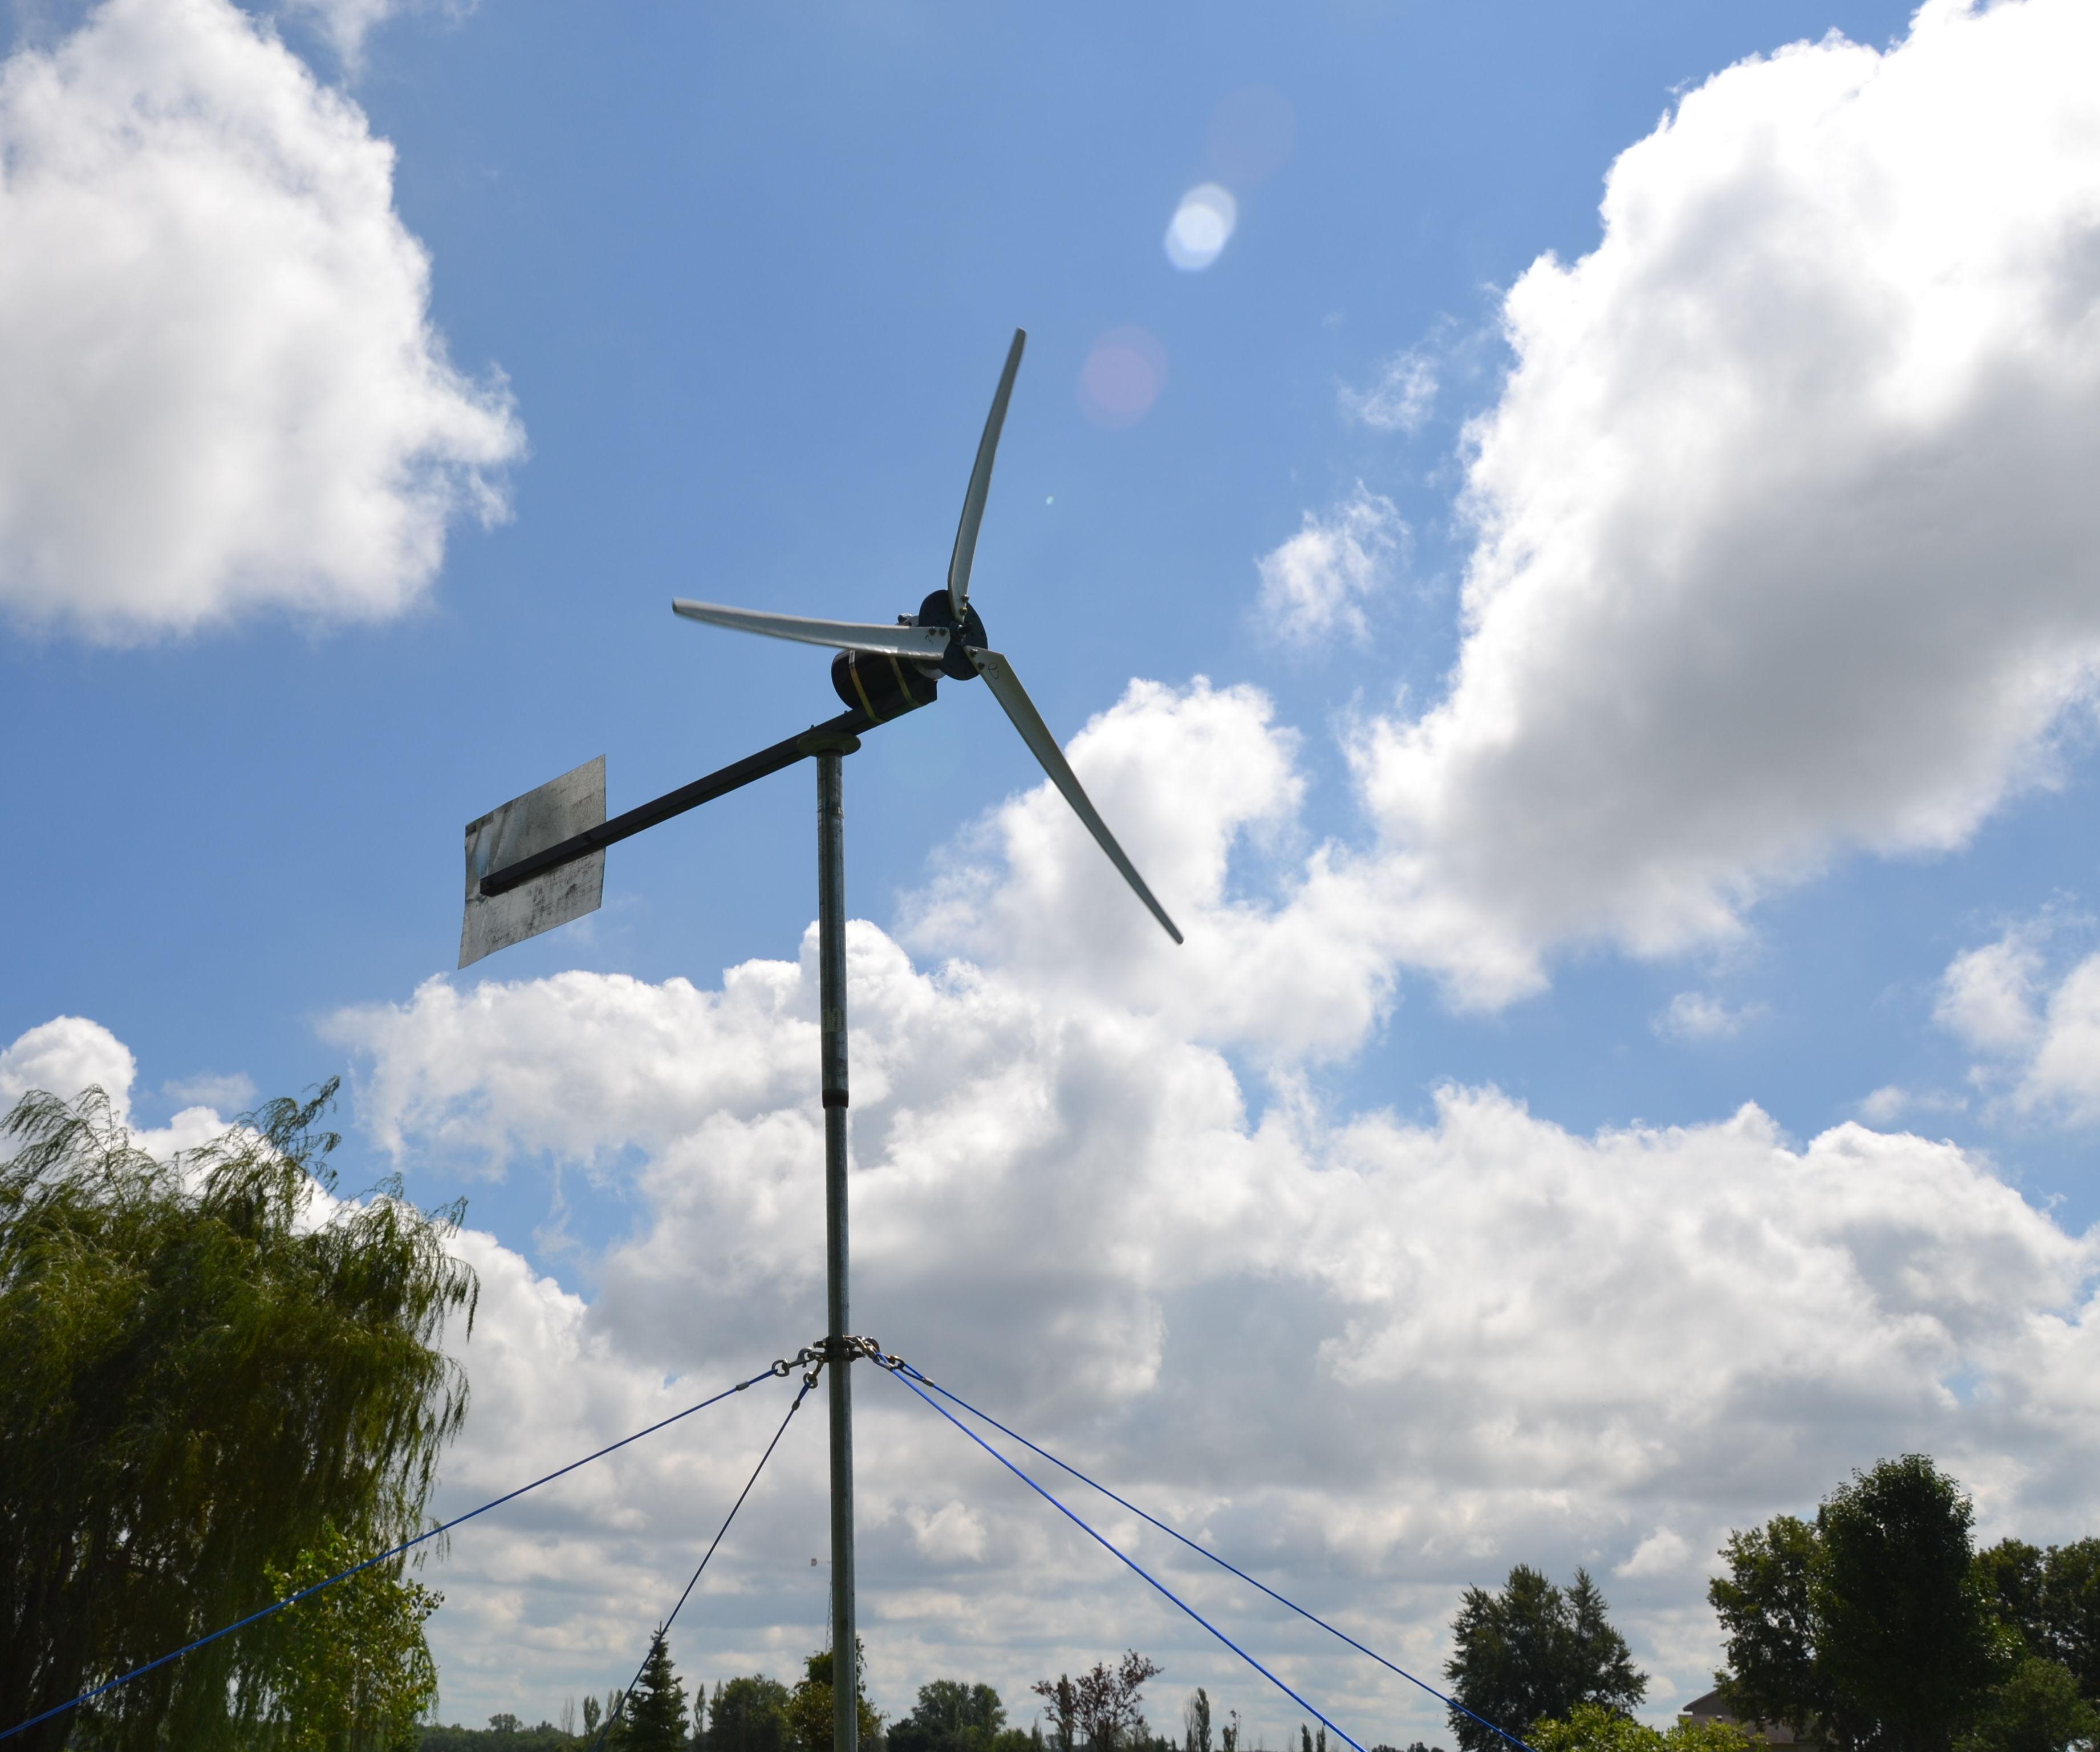 DIY  Watt Wind Turbine   Steps With Pictures - 12v 3 phase wind generator wiring diagram